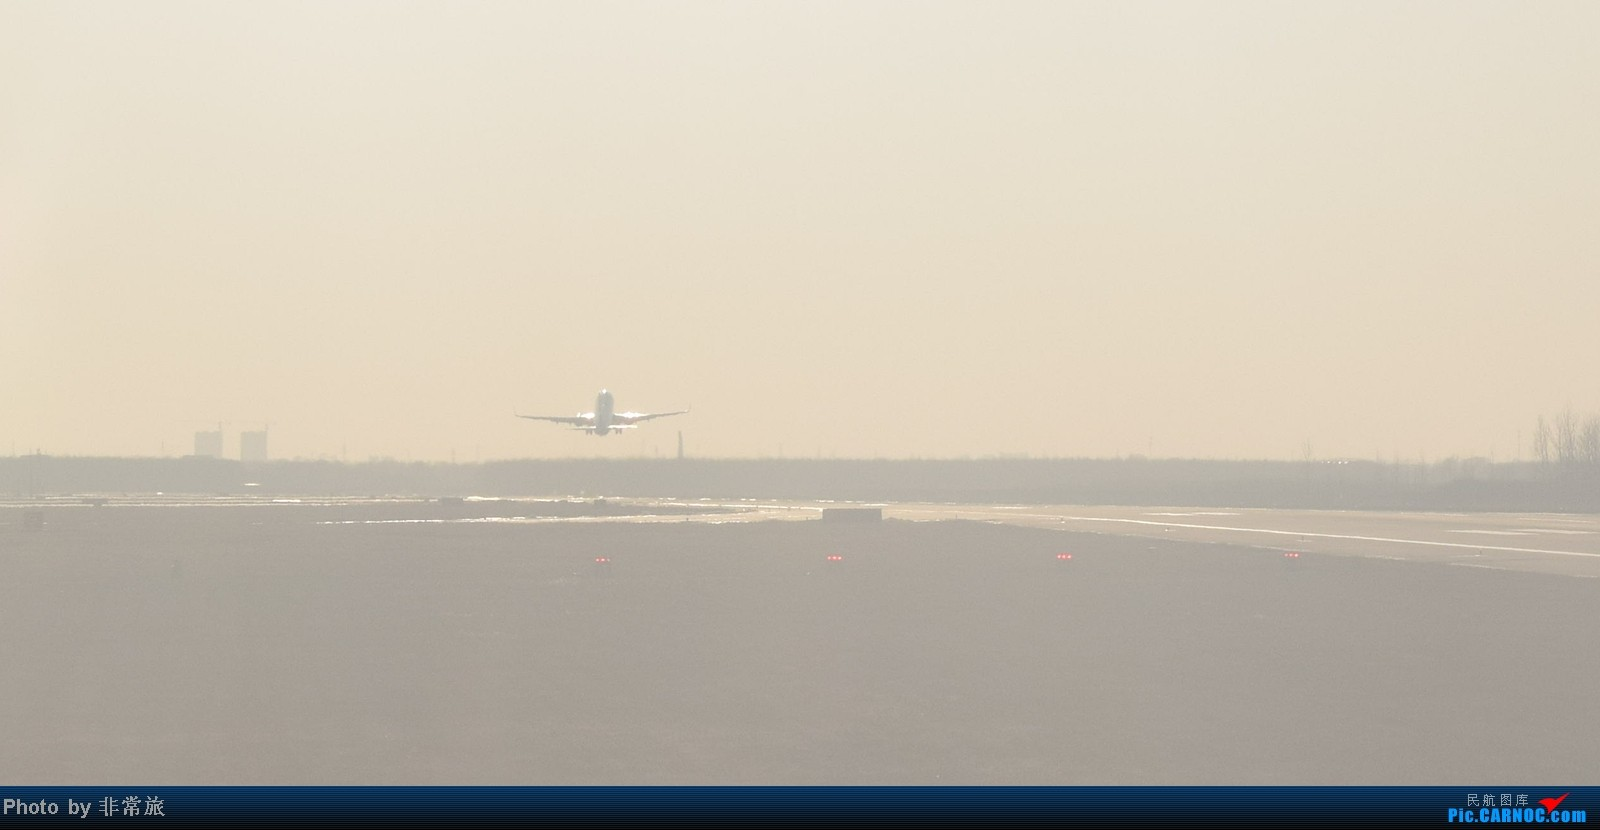 Re:[原创]大年三十除夕夜,三万英尺云霄间。 BOEING 737-800 B-5768 中国沈阳桃仙机场